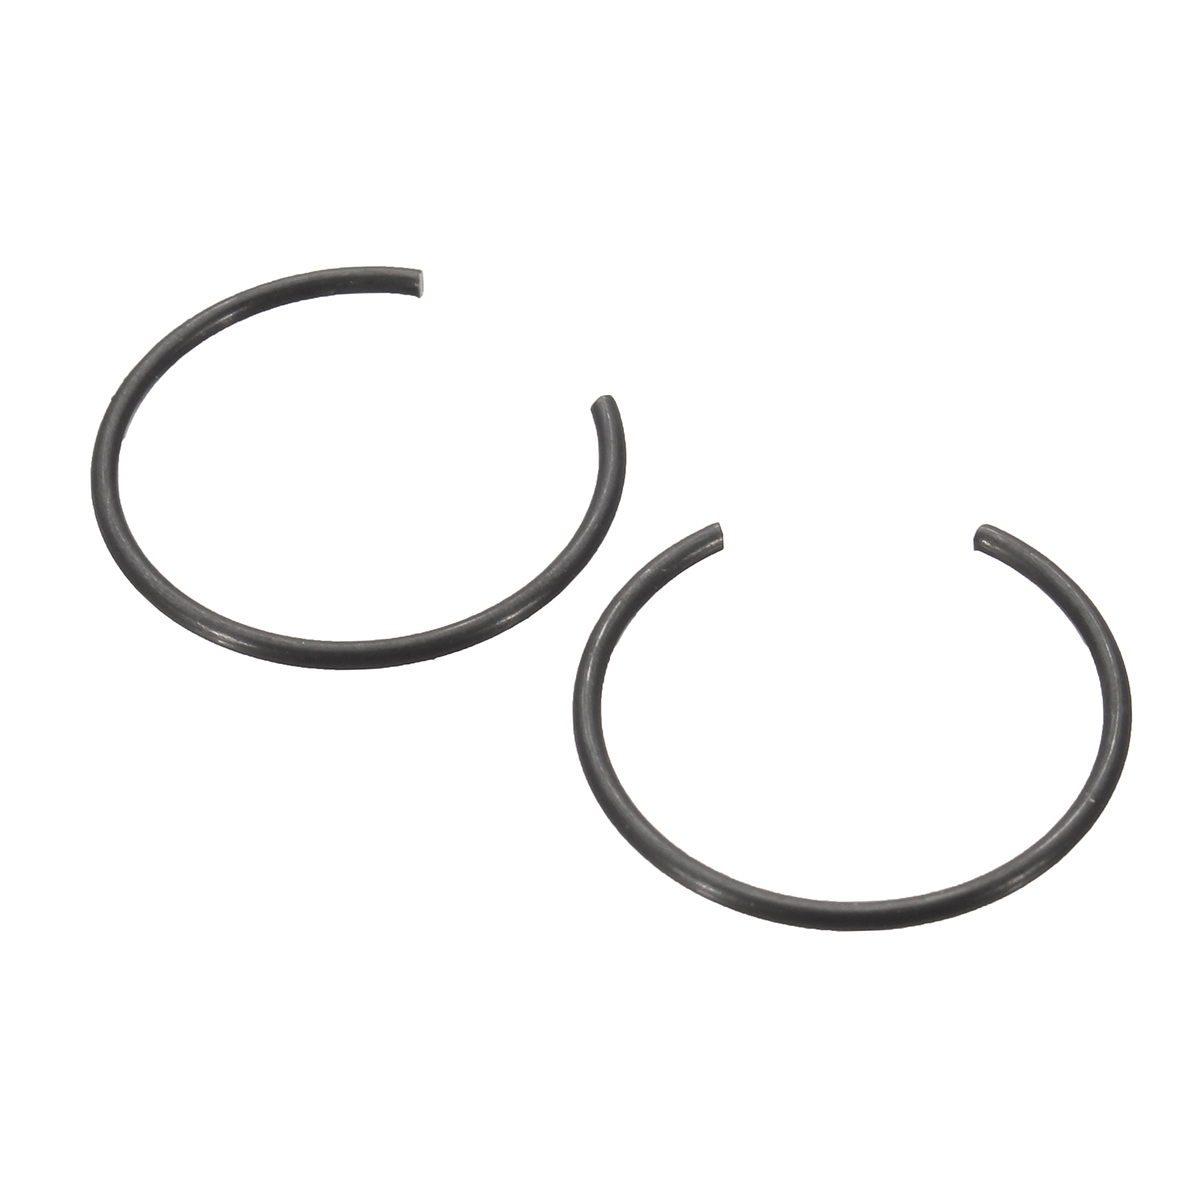 Piston Gasket Rings Wristpin Top End Kit For Yamaha